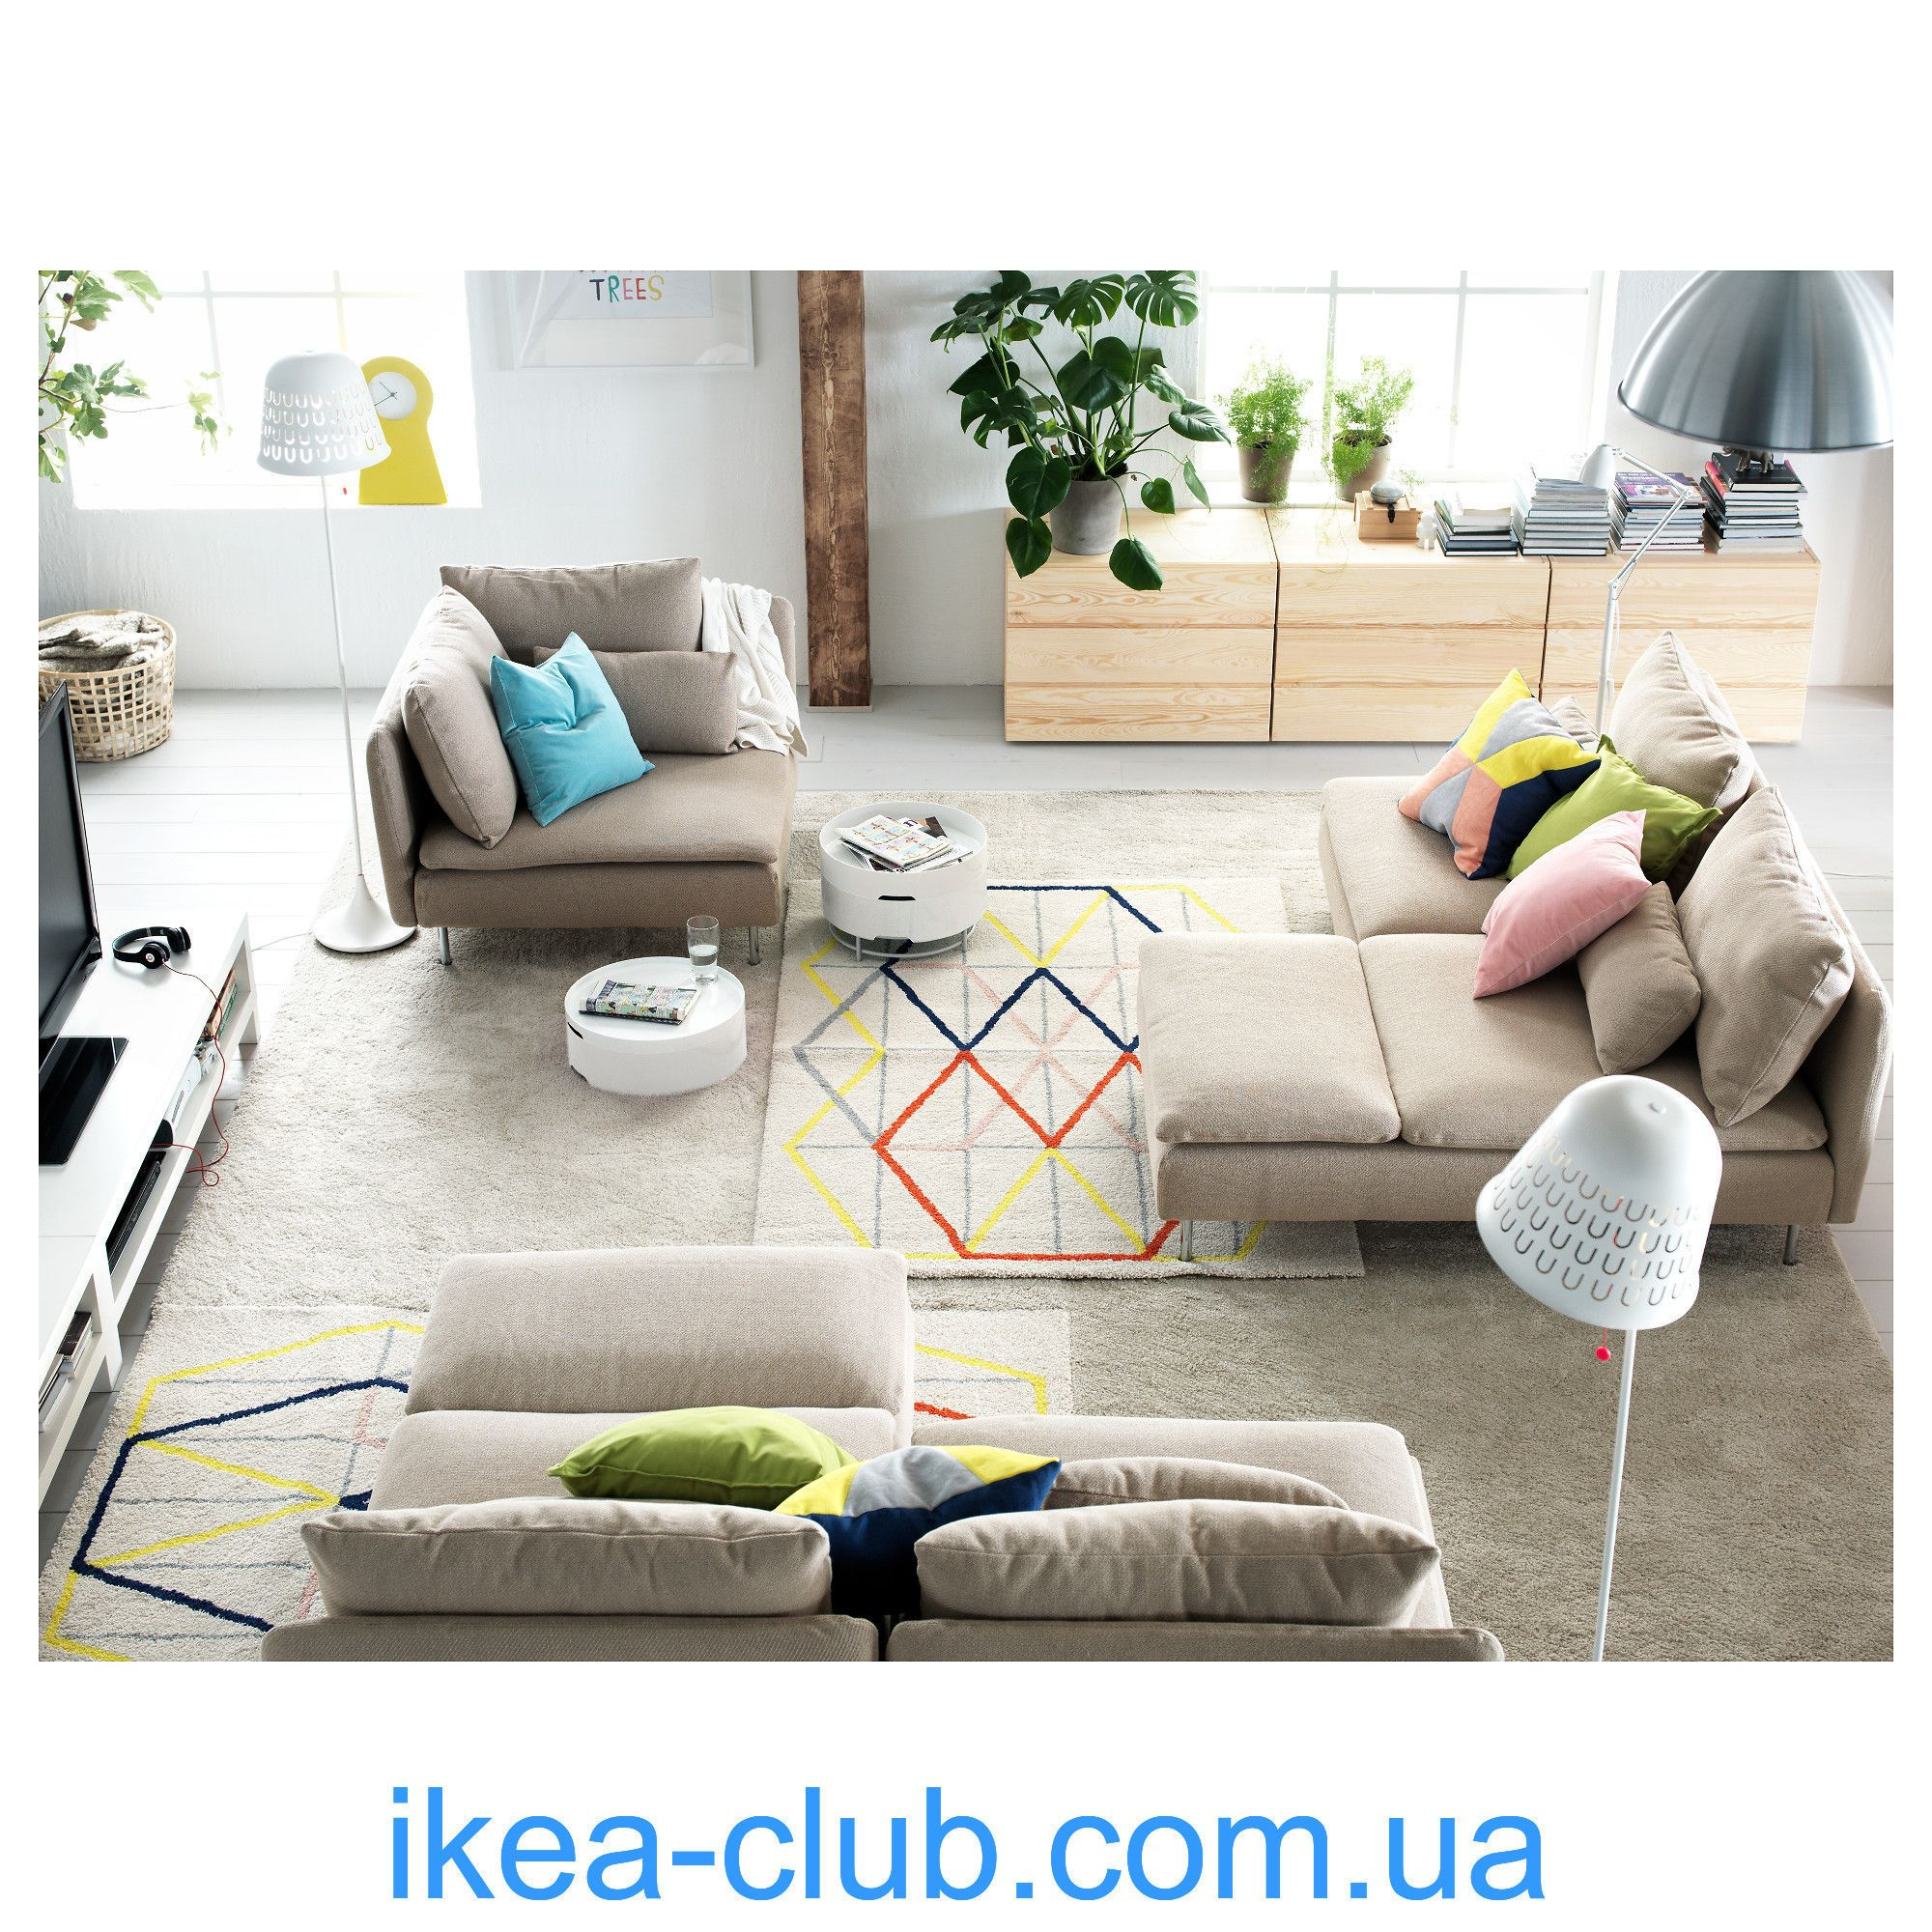 Ikea Ikea Ps 2014 702 647 28 Ikea Living Room Living Room Furniture Sofas Family Living Rooms